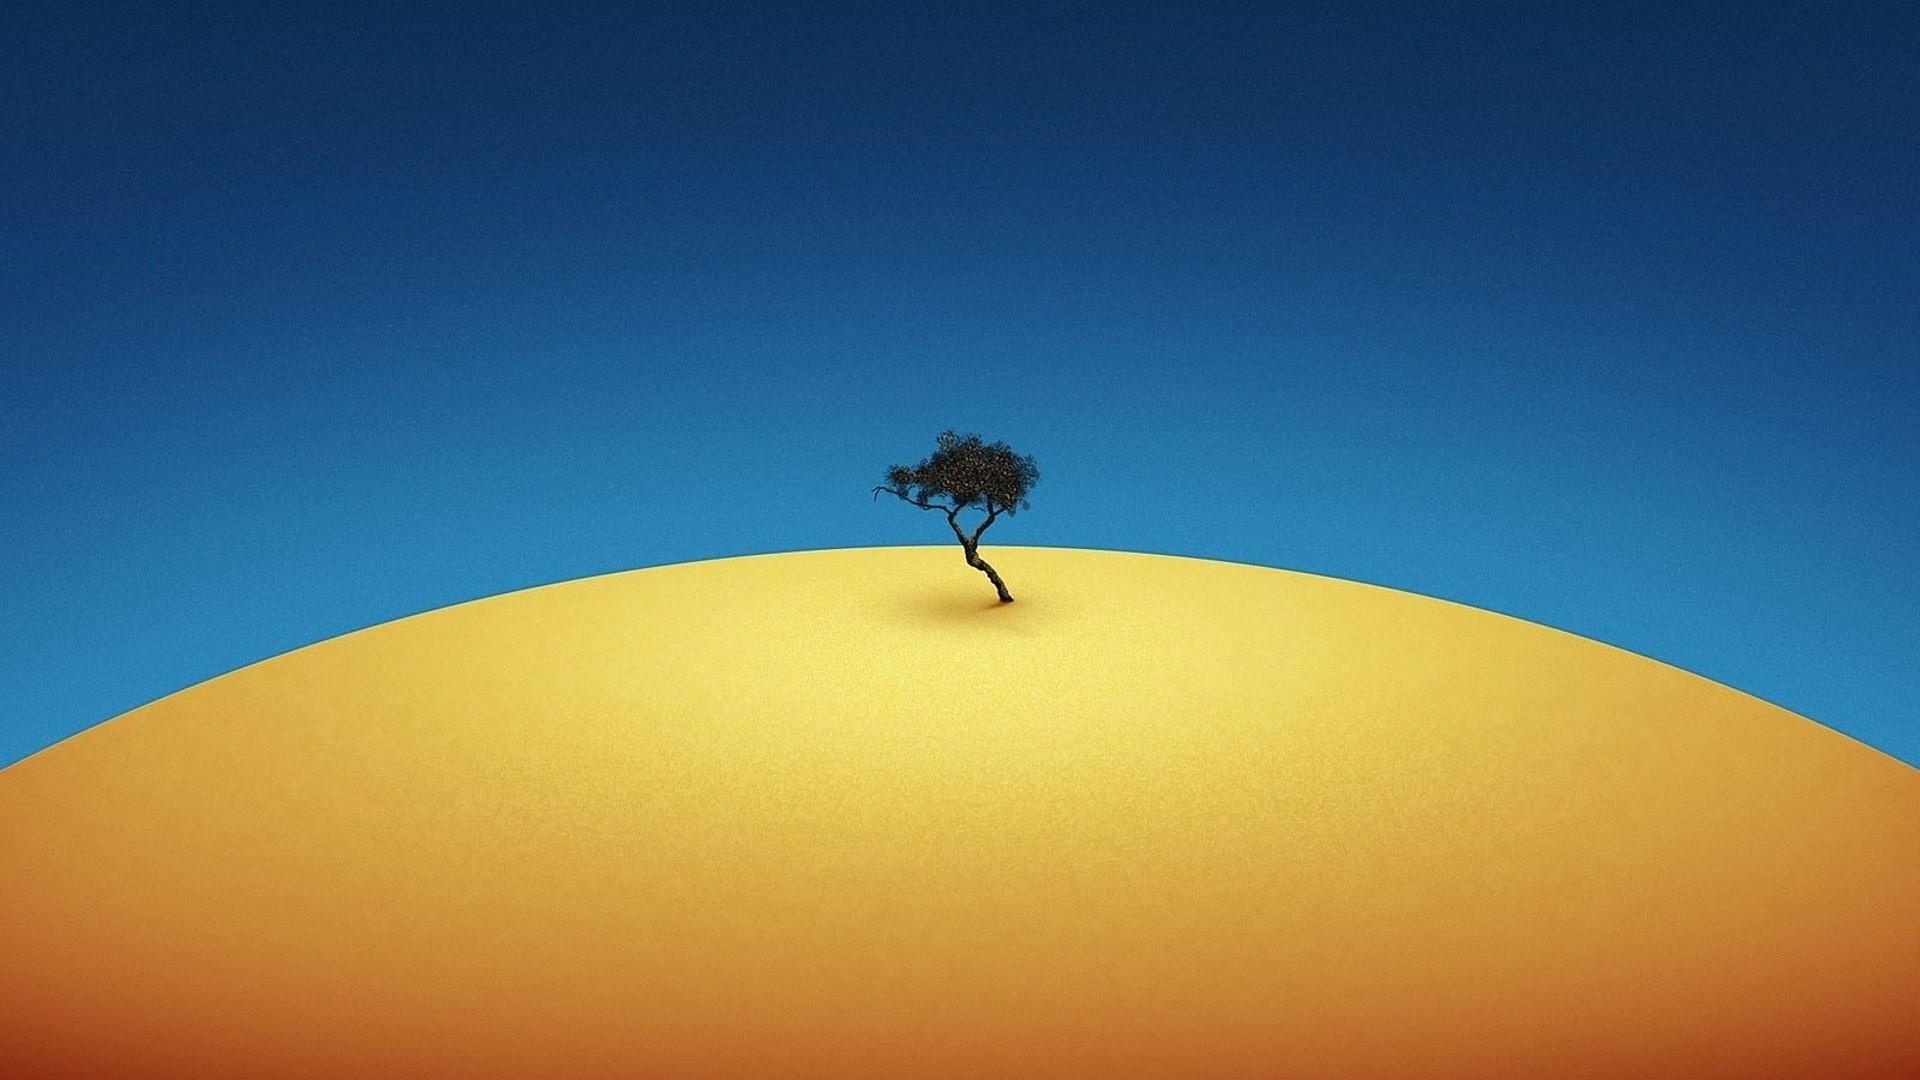 Lonely Trees Minimalist Desktop Wallpaper